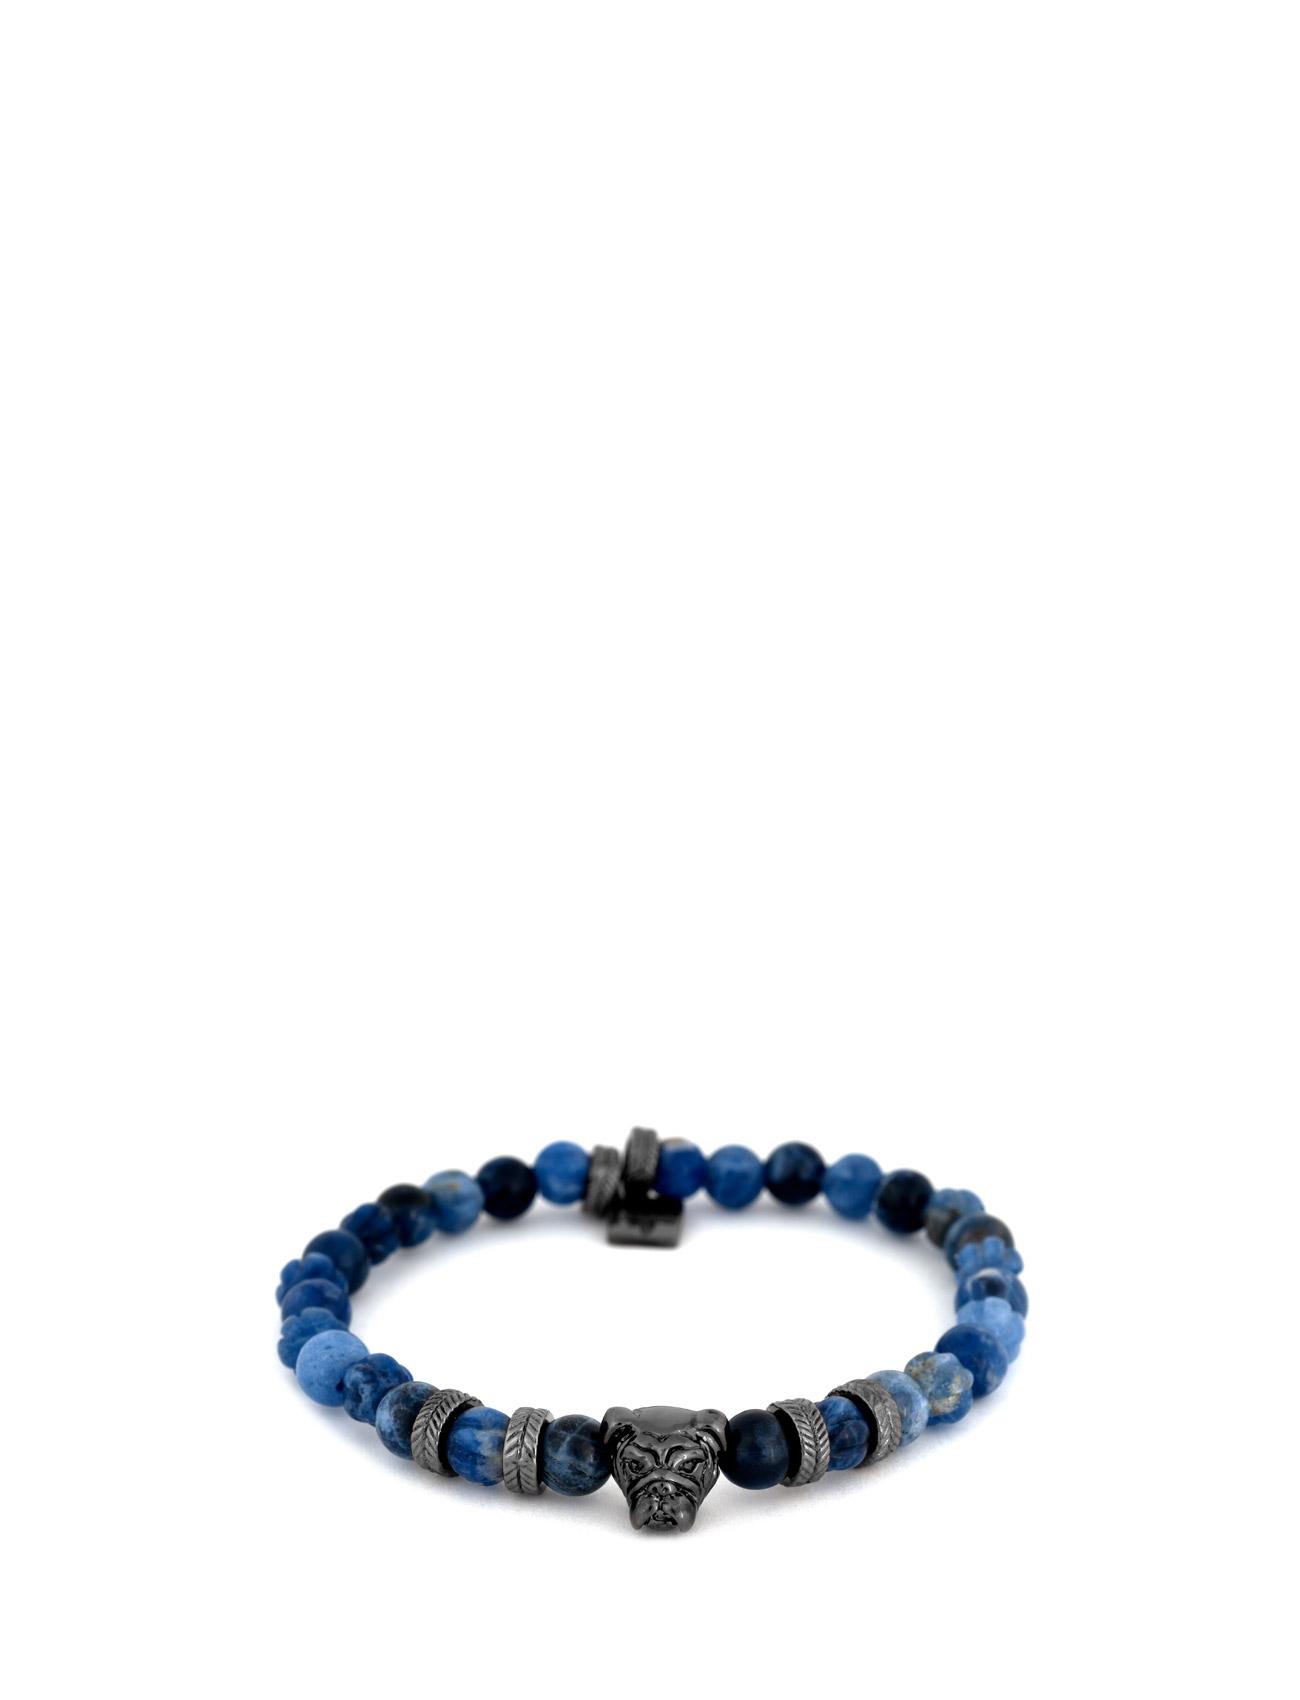 Köpa billiga Thompson Bulldog Bracelet online